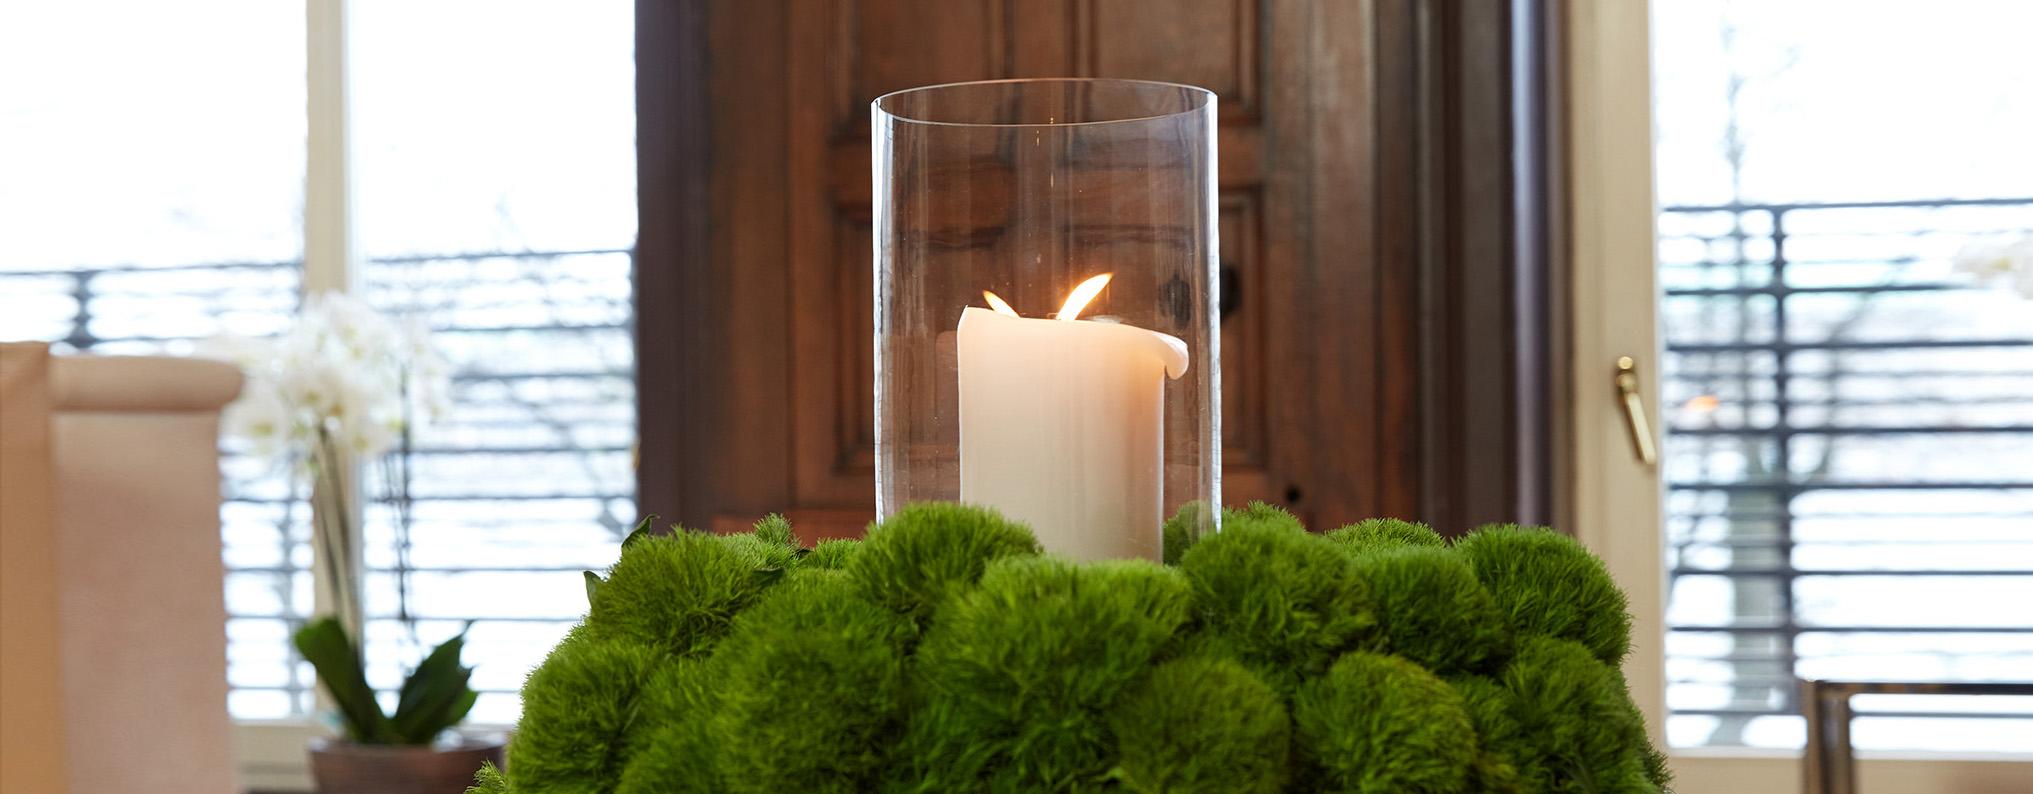 Keramikimplantate-Advent-Praxisraeume-1